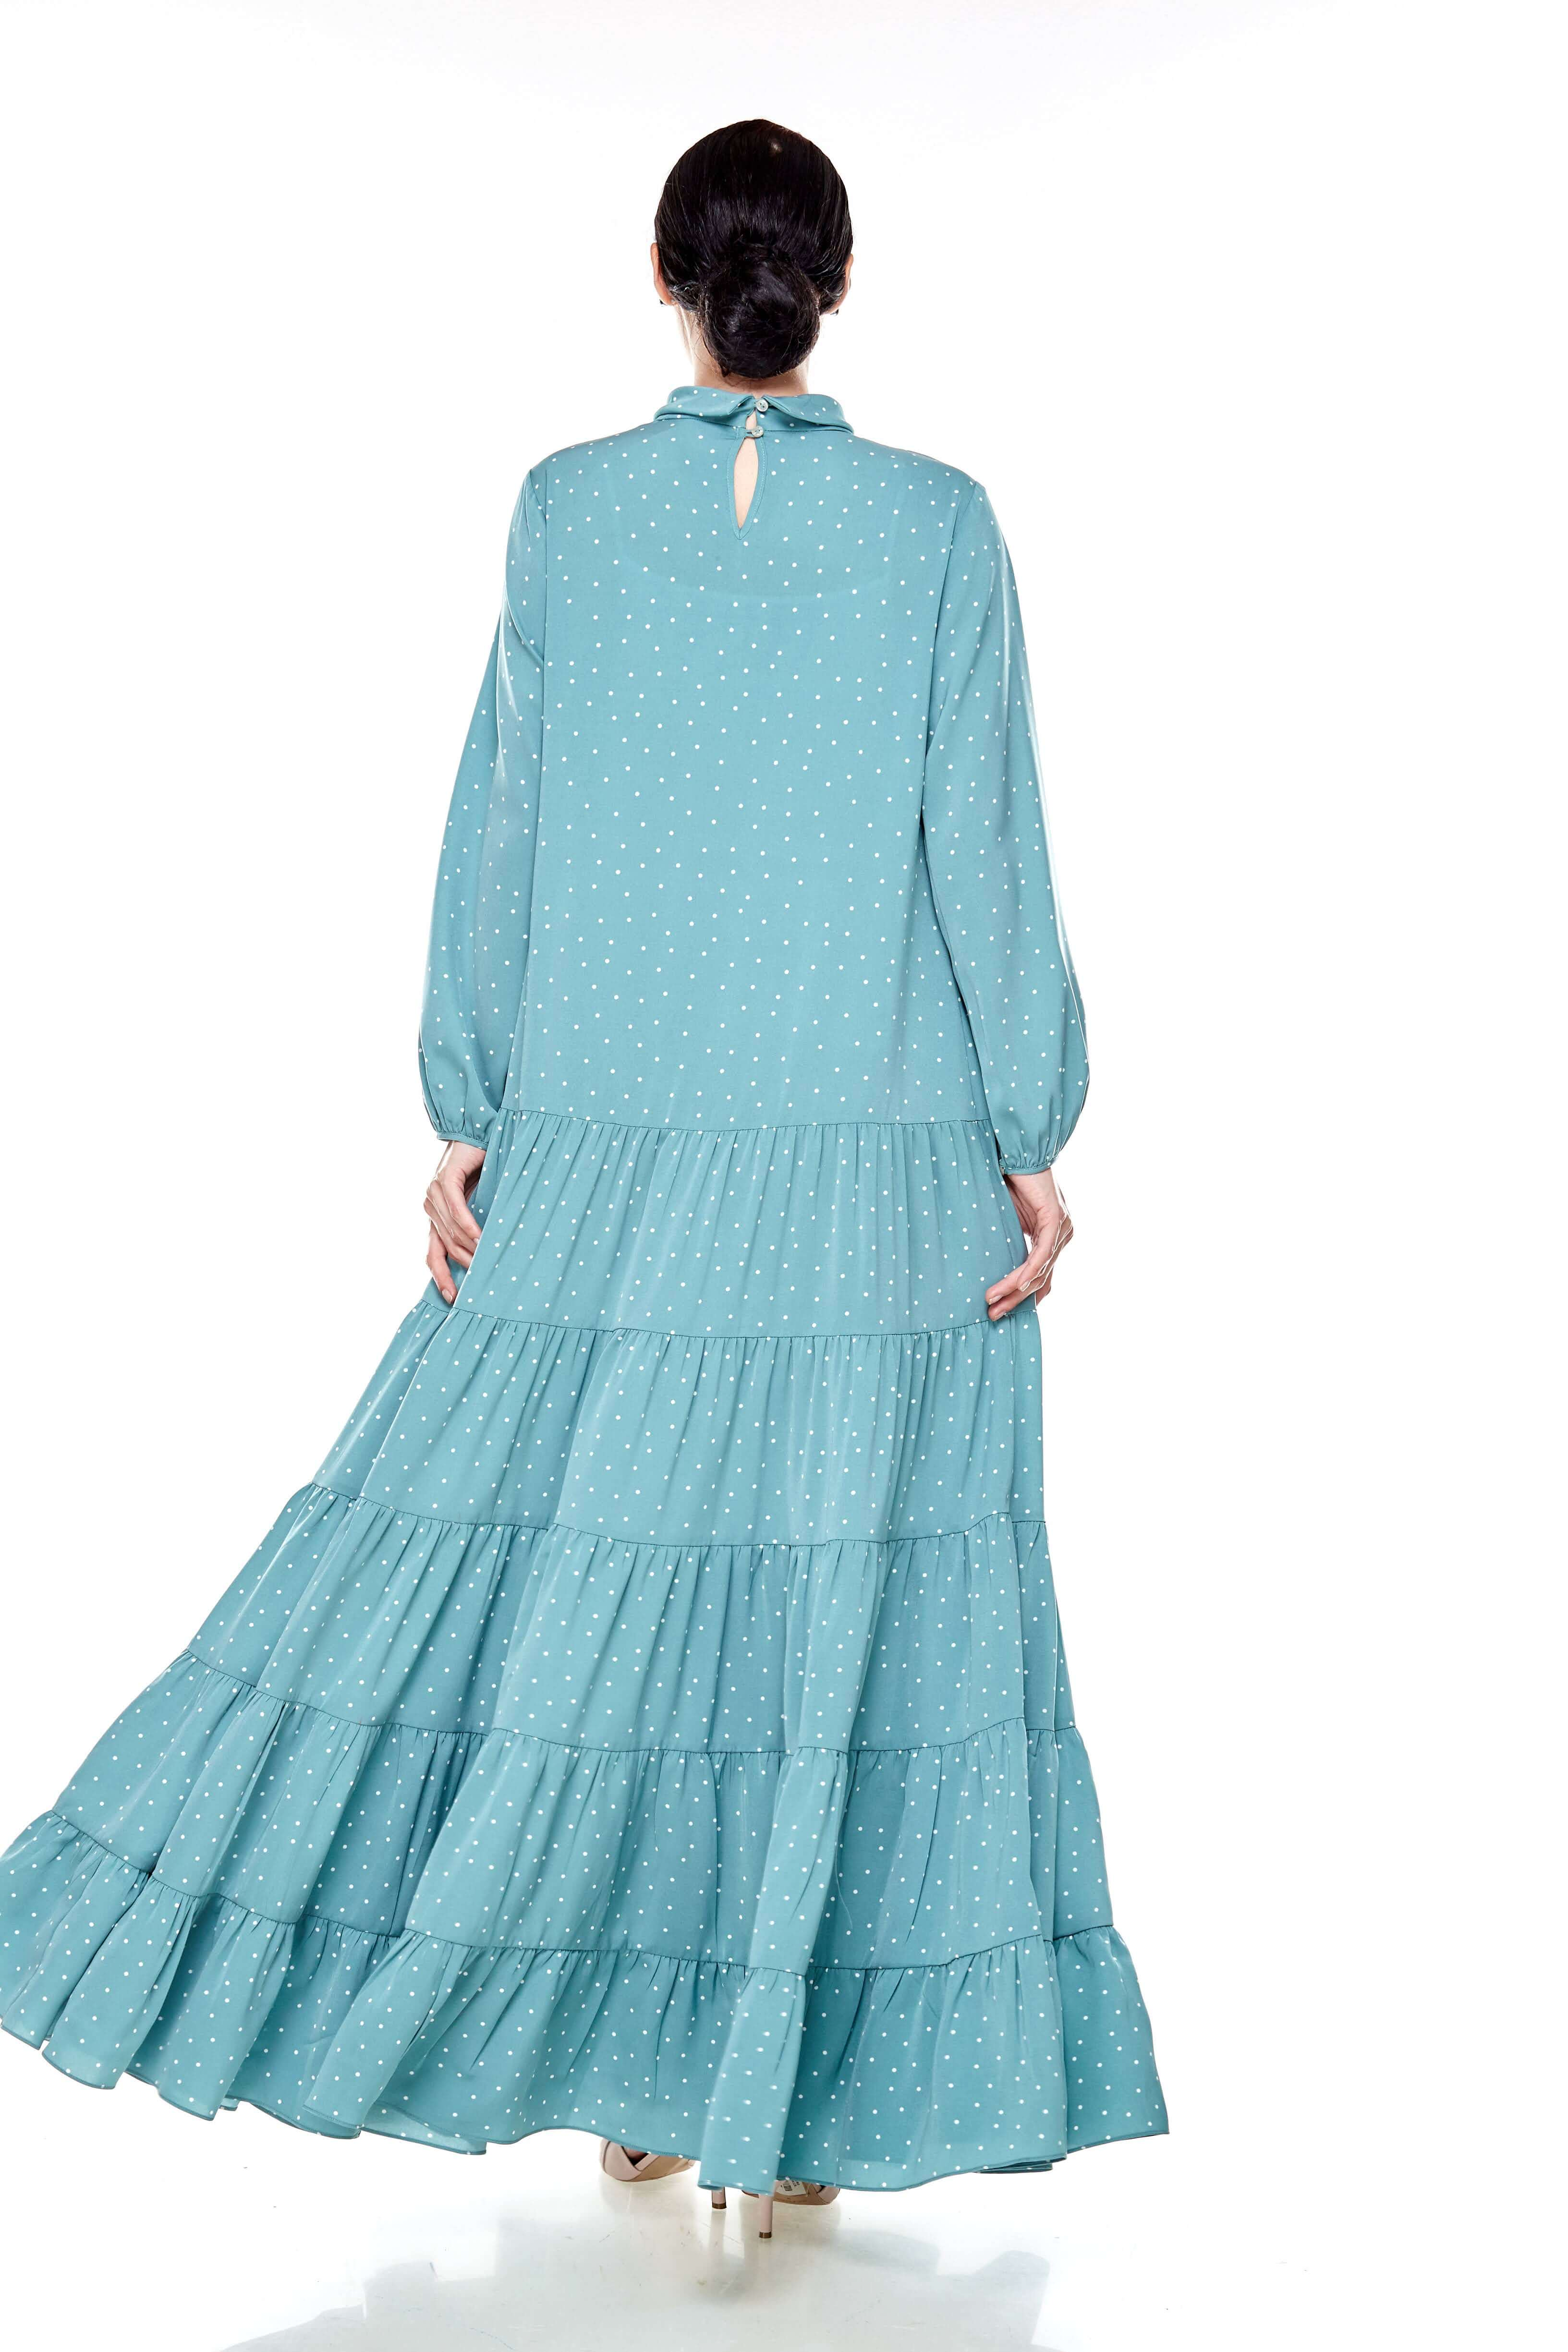 Mint Polka Dot Stand Collar Tier Dress (4)